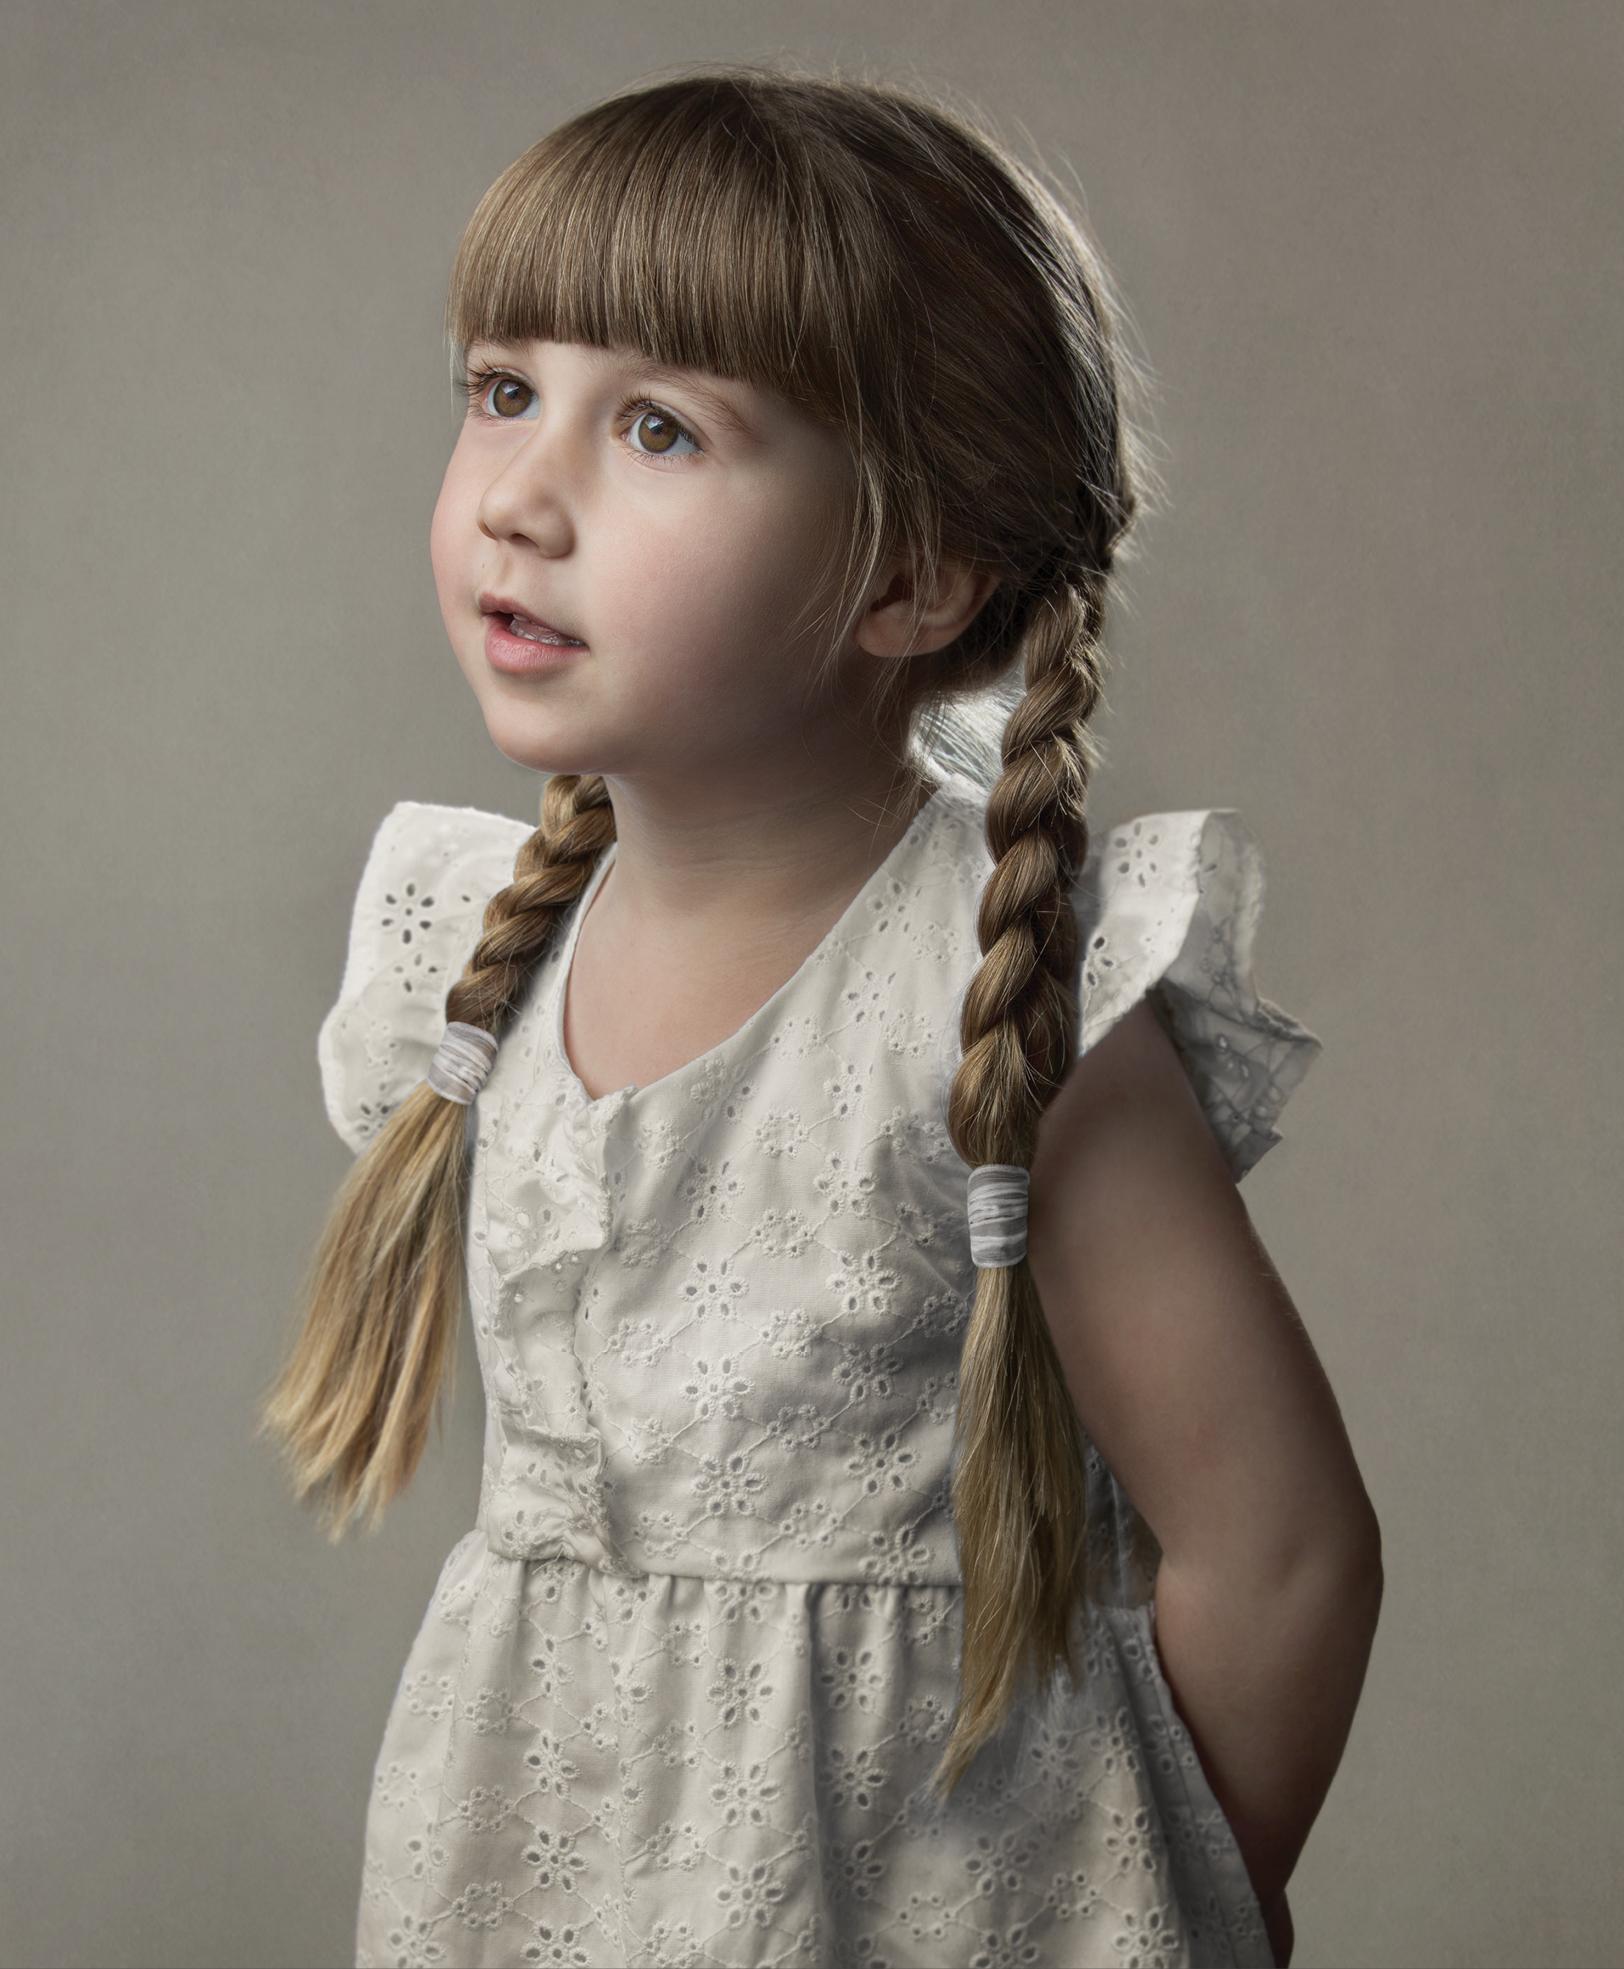 FIne-Art-Child-Portraits-5.jpg